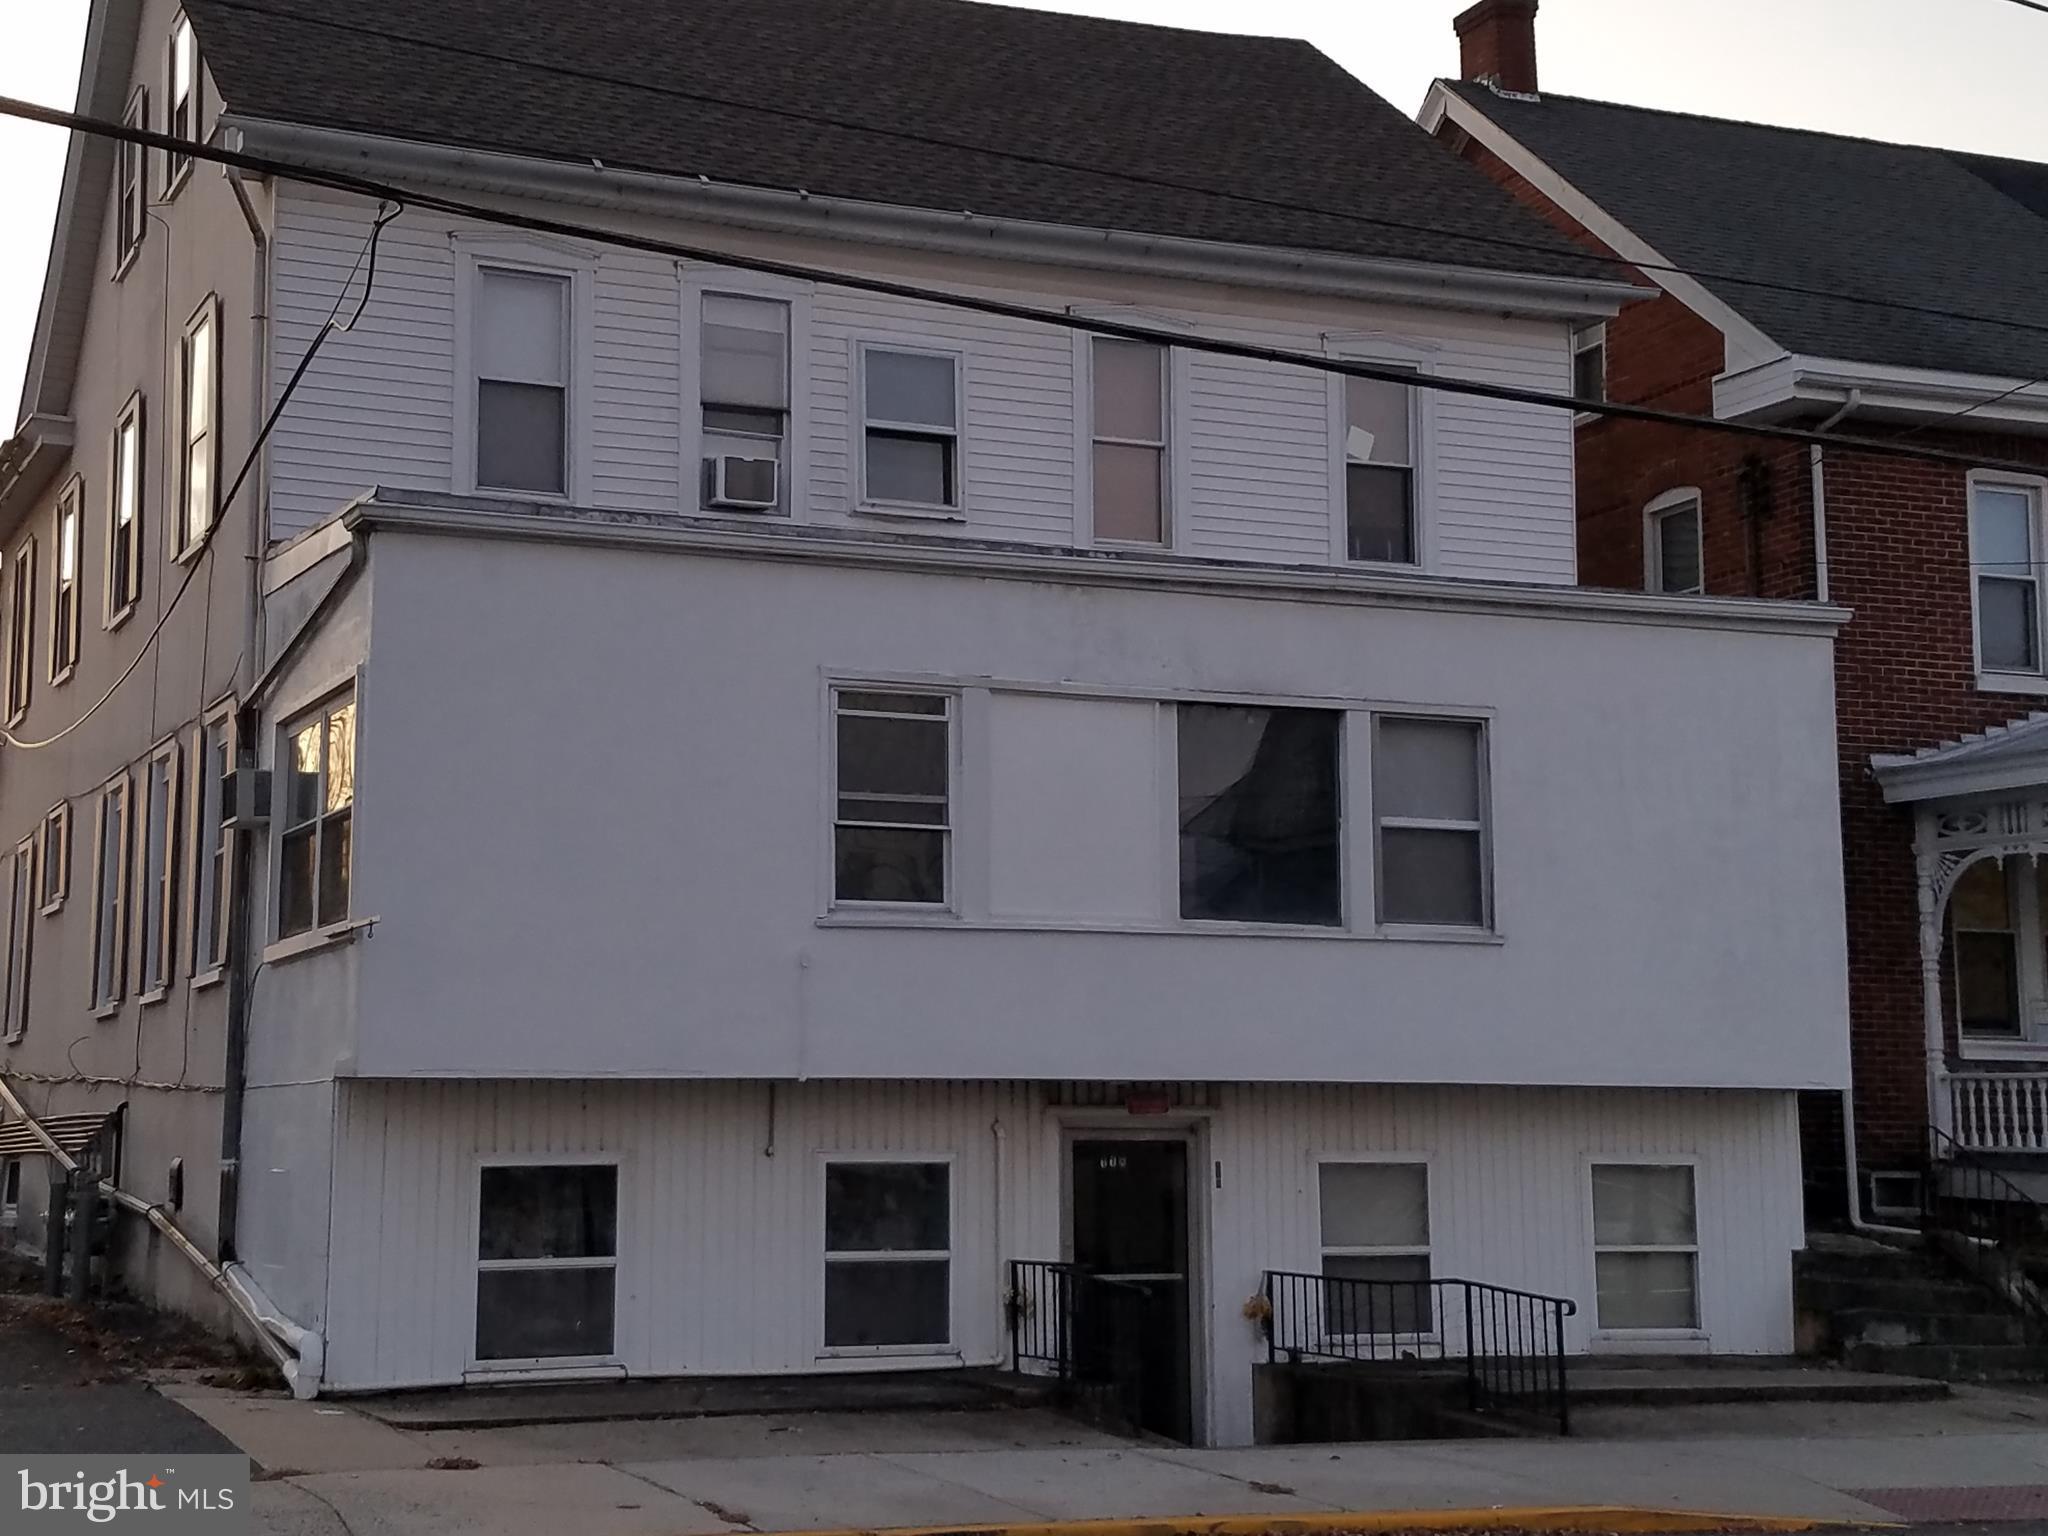 120 MAIN STREET, EAST GREENVILLE, PA 18041